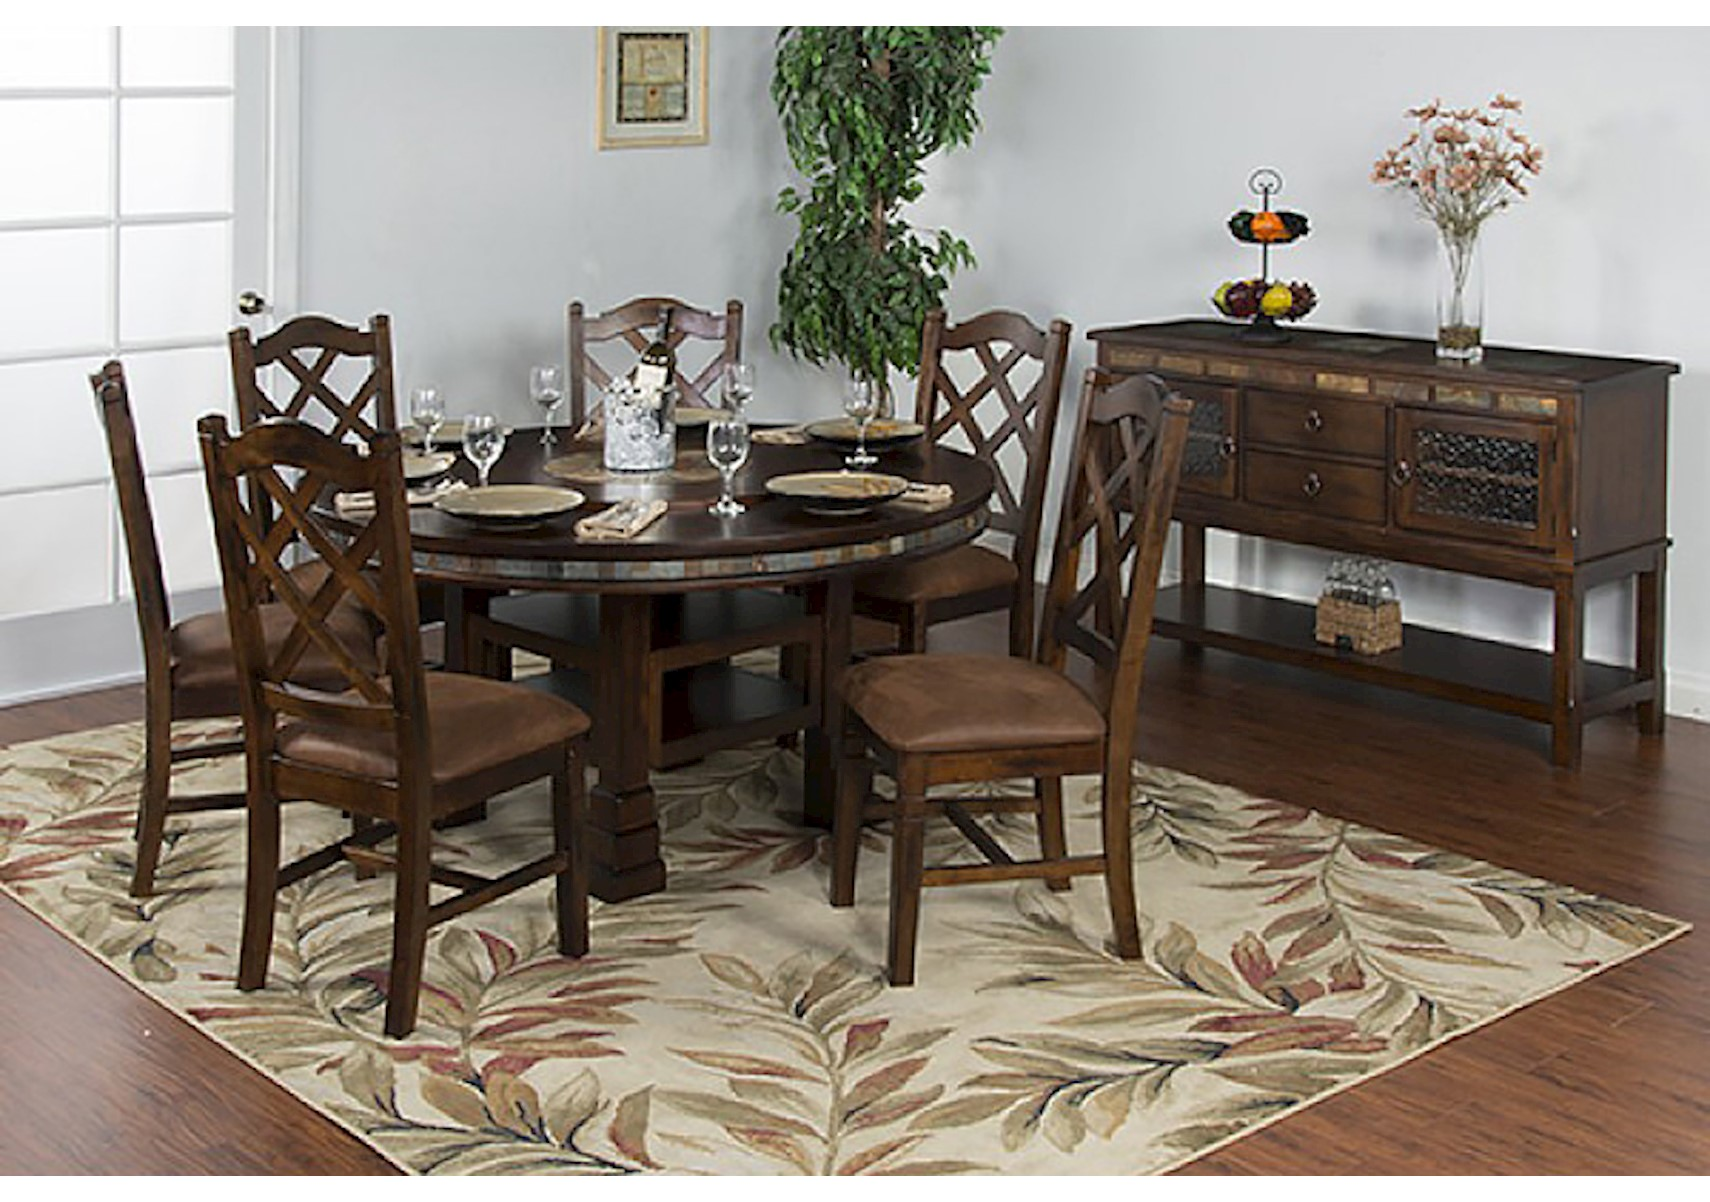 Lacks | Santa Fe 7 Pc Round Table Dining Set